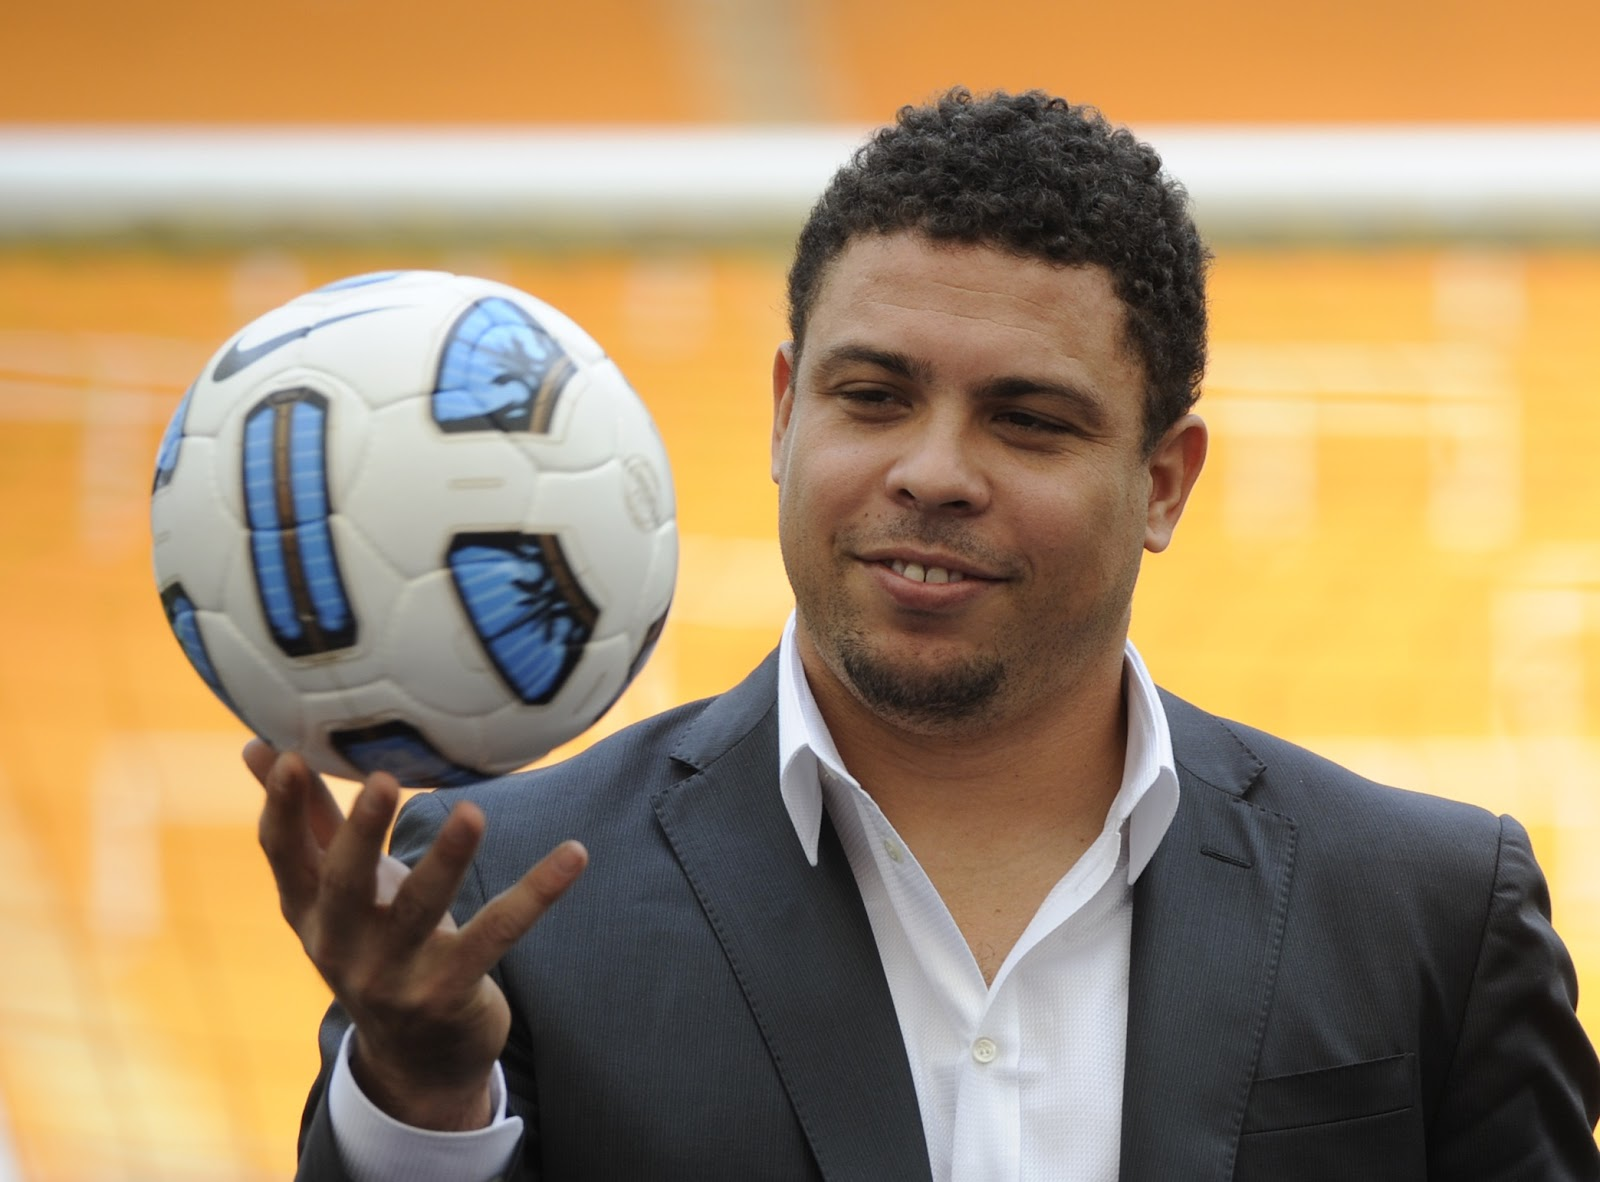 http://3.bp.blogspot.com/-jJPZRs27pQ4/UFNy0P0JVhI/AAAAAAAAGWA/w7UPTnuxnmA/s1600/Ronaldo+Messi+est%C3%A1+un+poco+por+encima+de+Cristiano.jpg